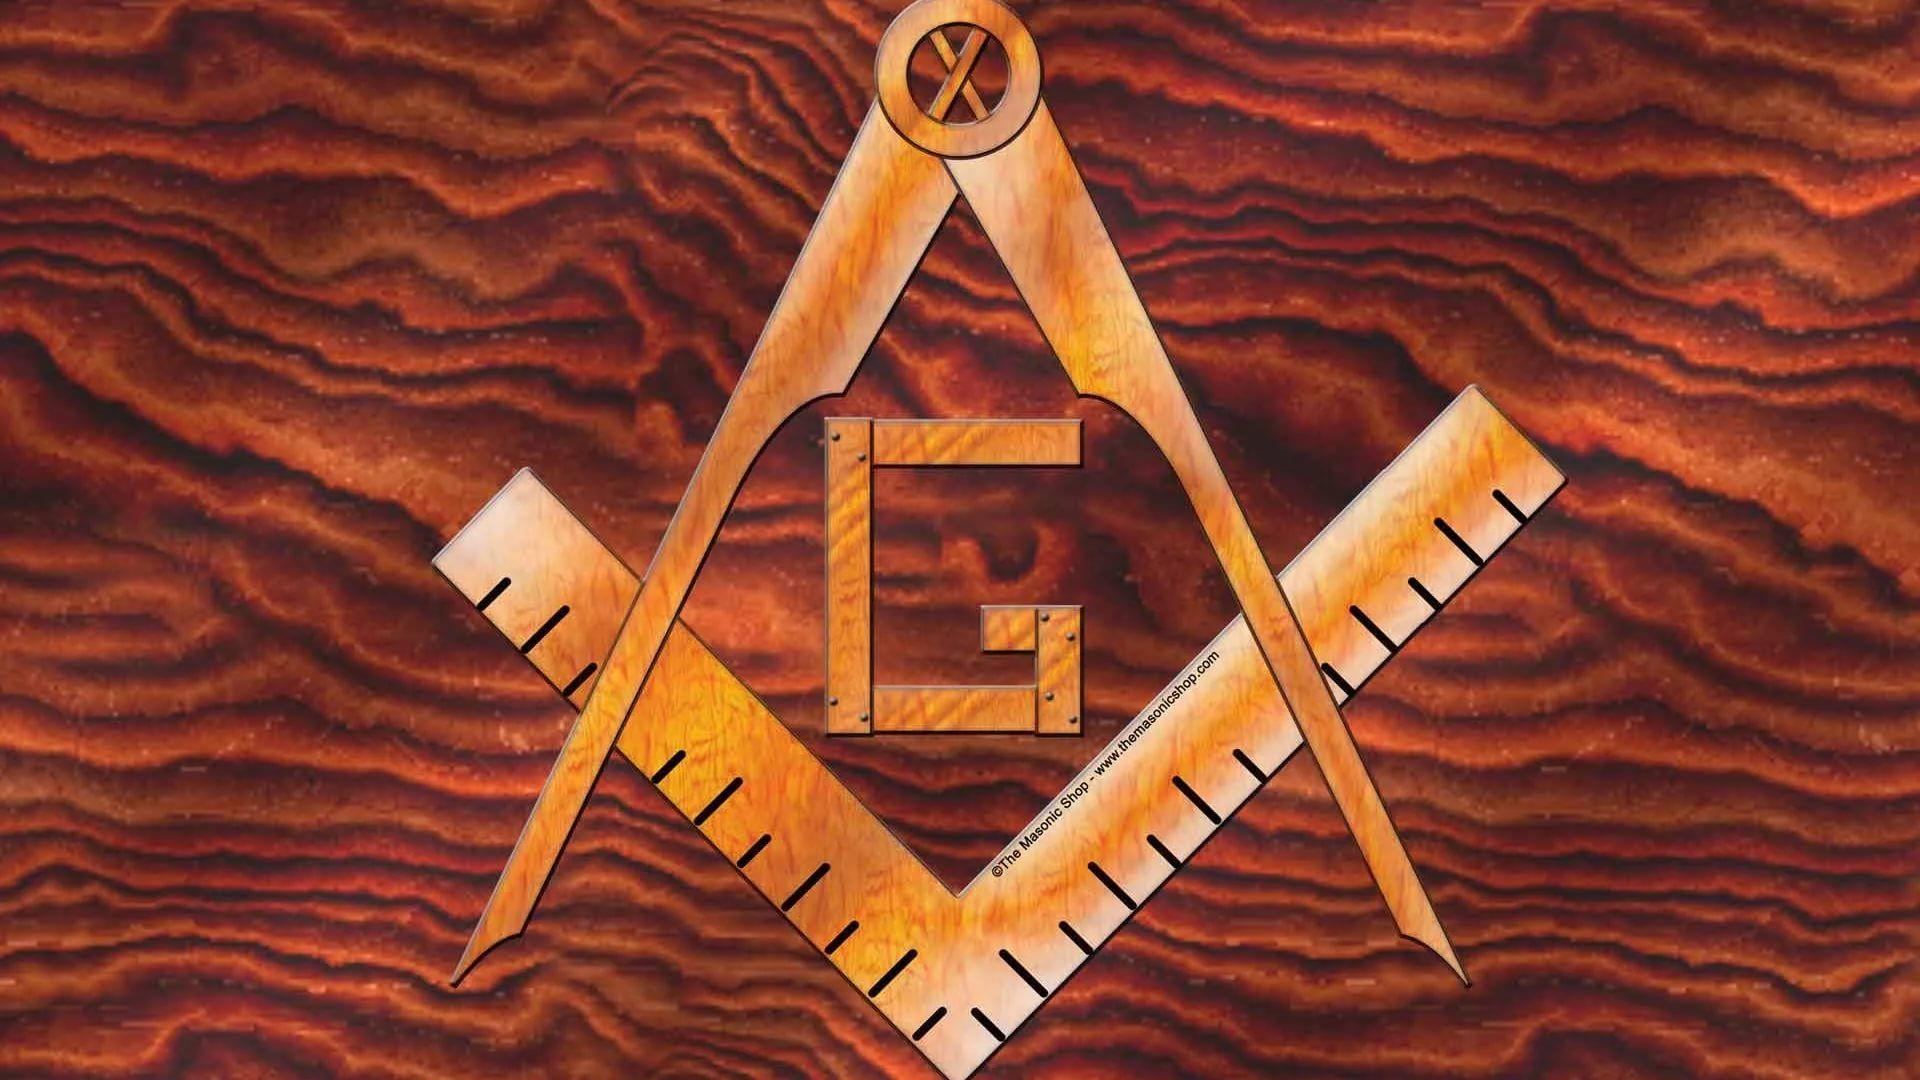 Freemason hd wallpaper for laptop